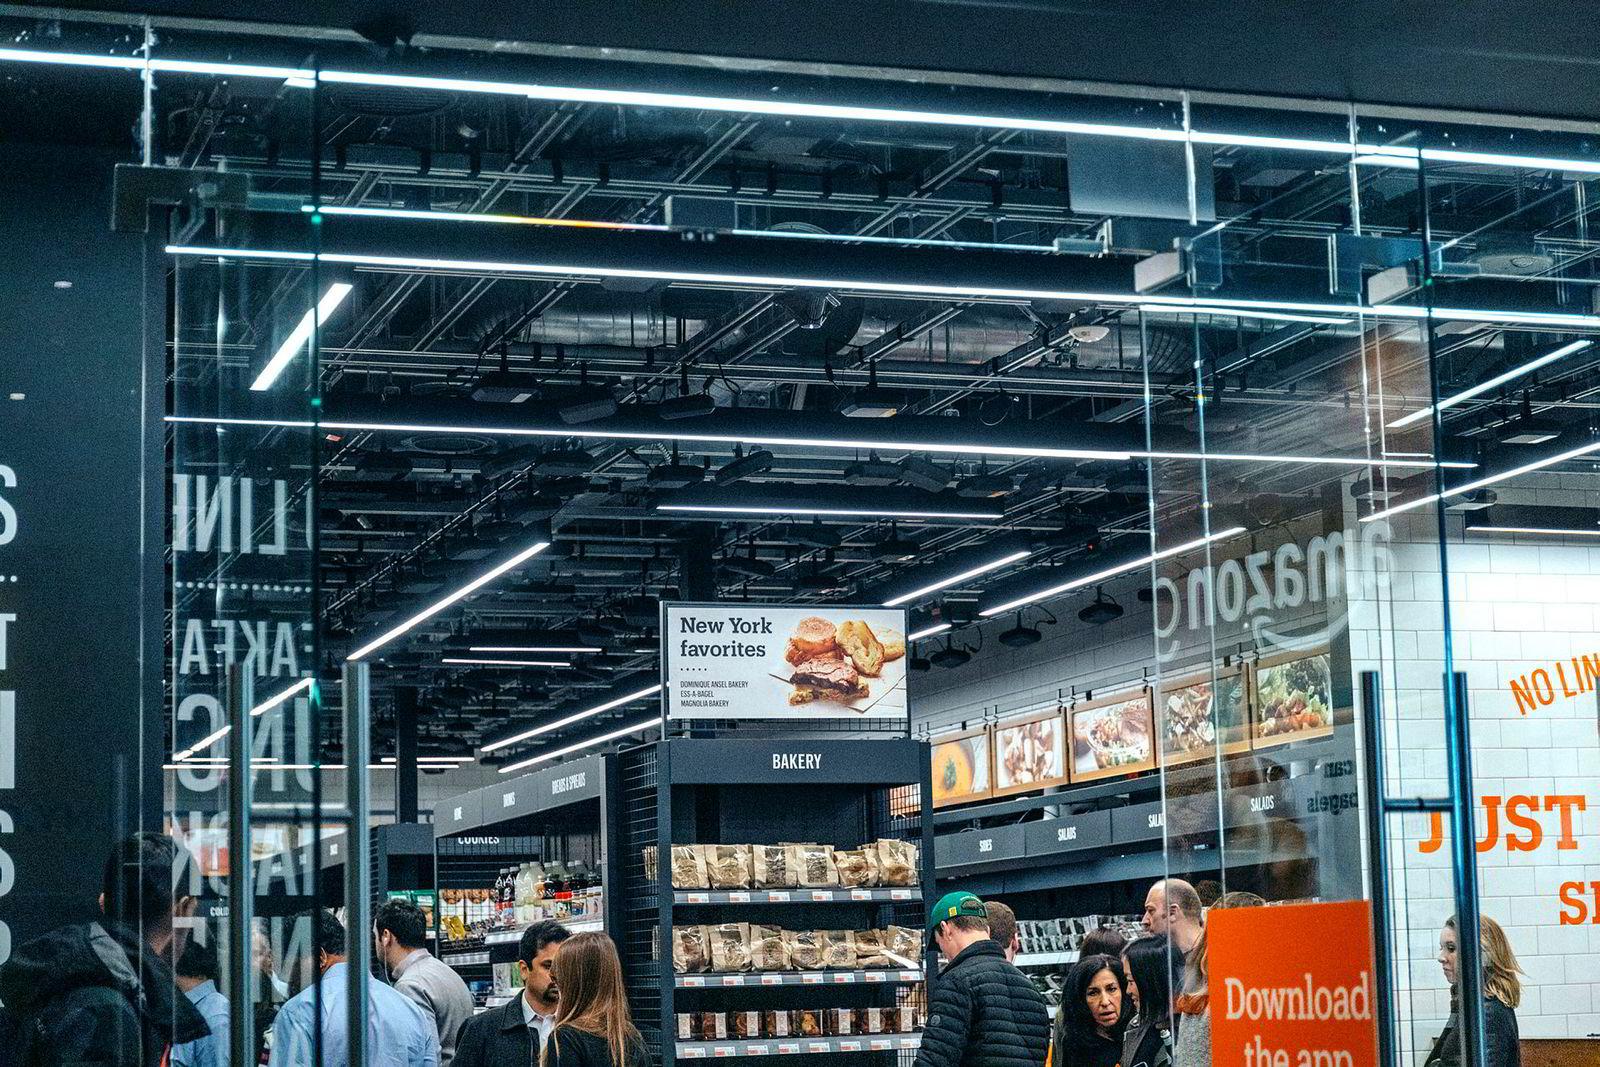 Sensorer i taket som ser alt du tar i AmazonGo butikken i Manhattans finansdistrikt.